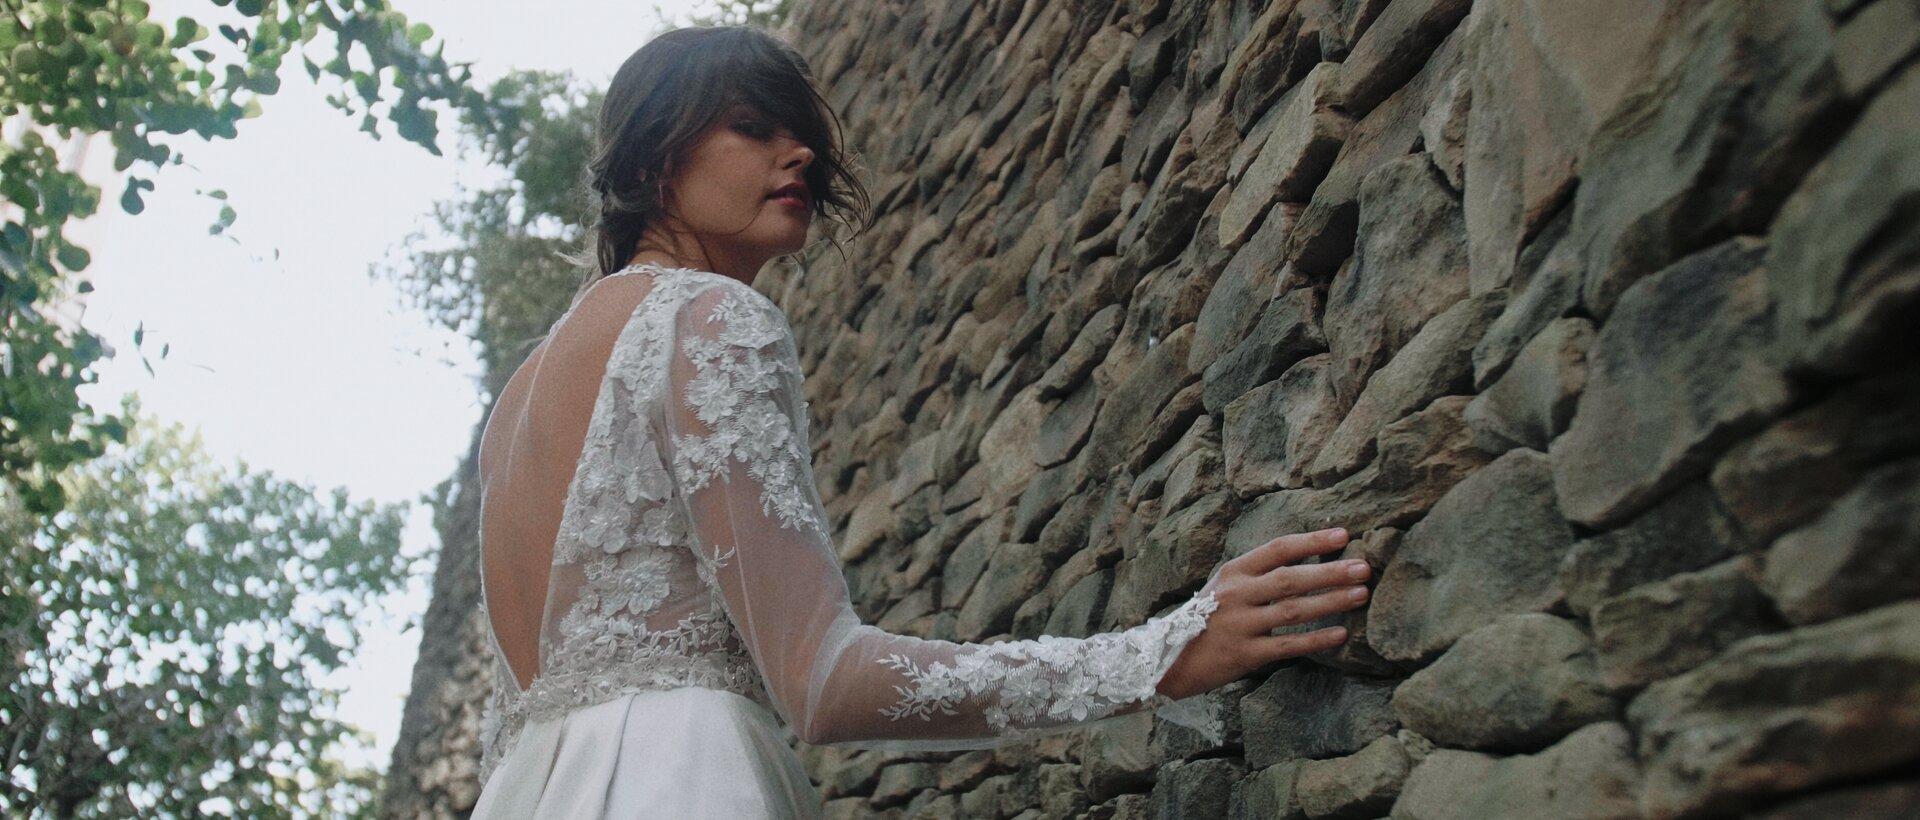 bride walking by Montage Kapalua stone wall luxury wedding